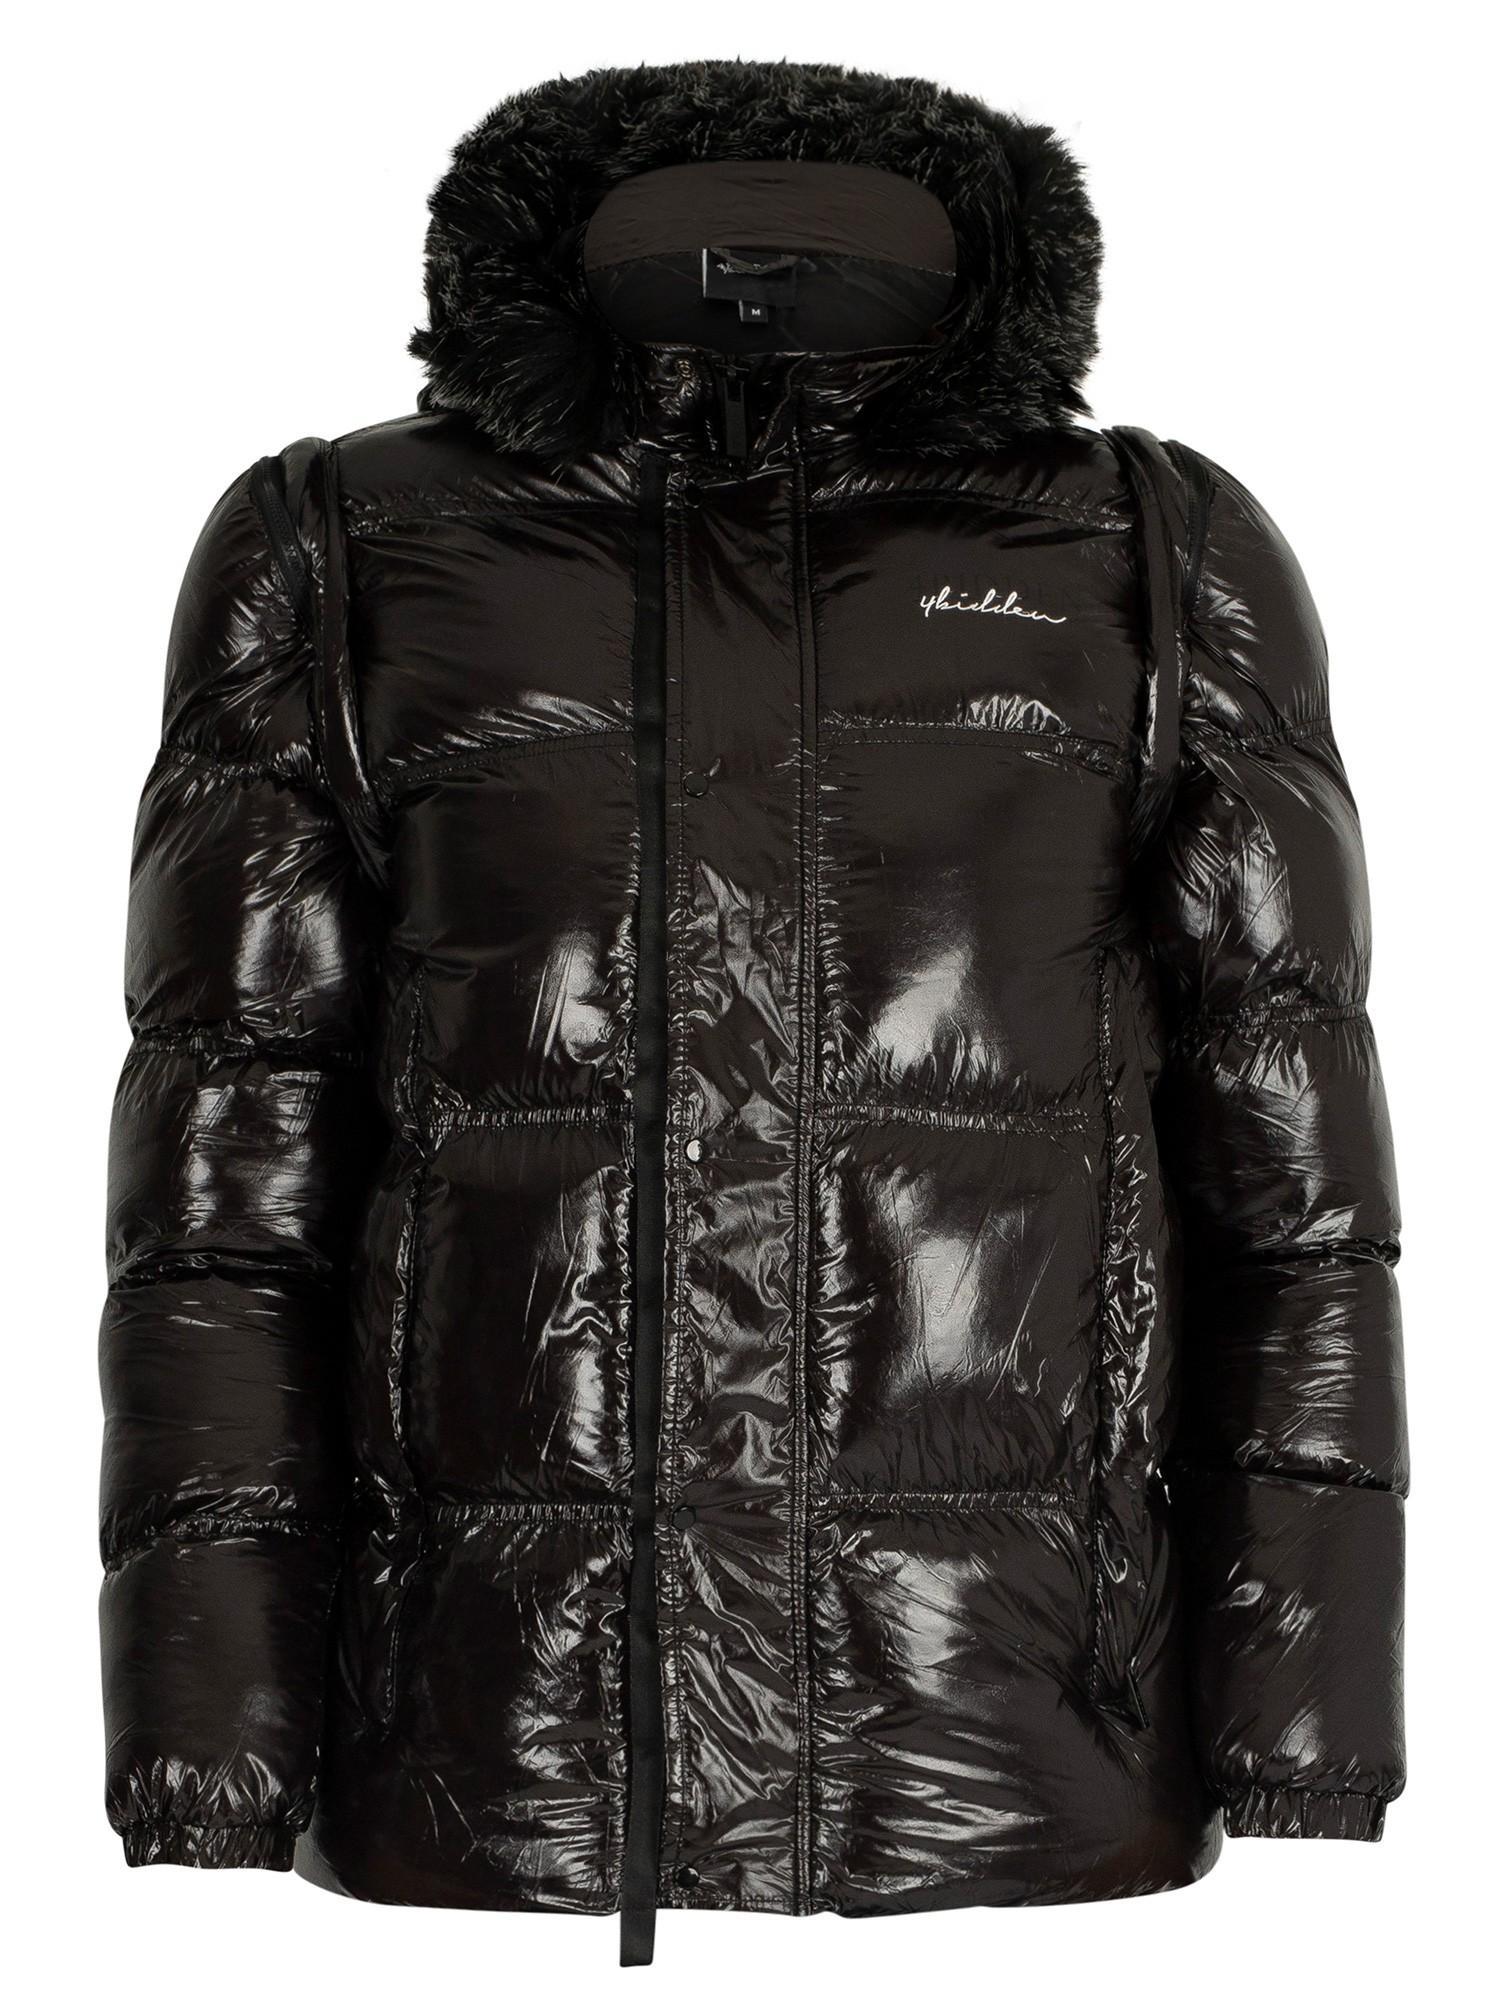 Black 4Bidden Men/'s Overcast Parka Jacket